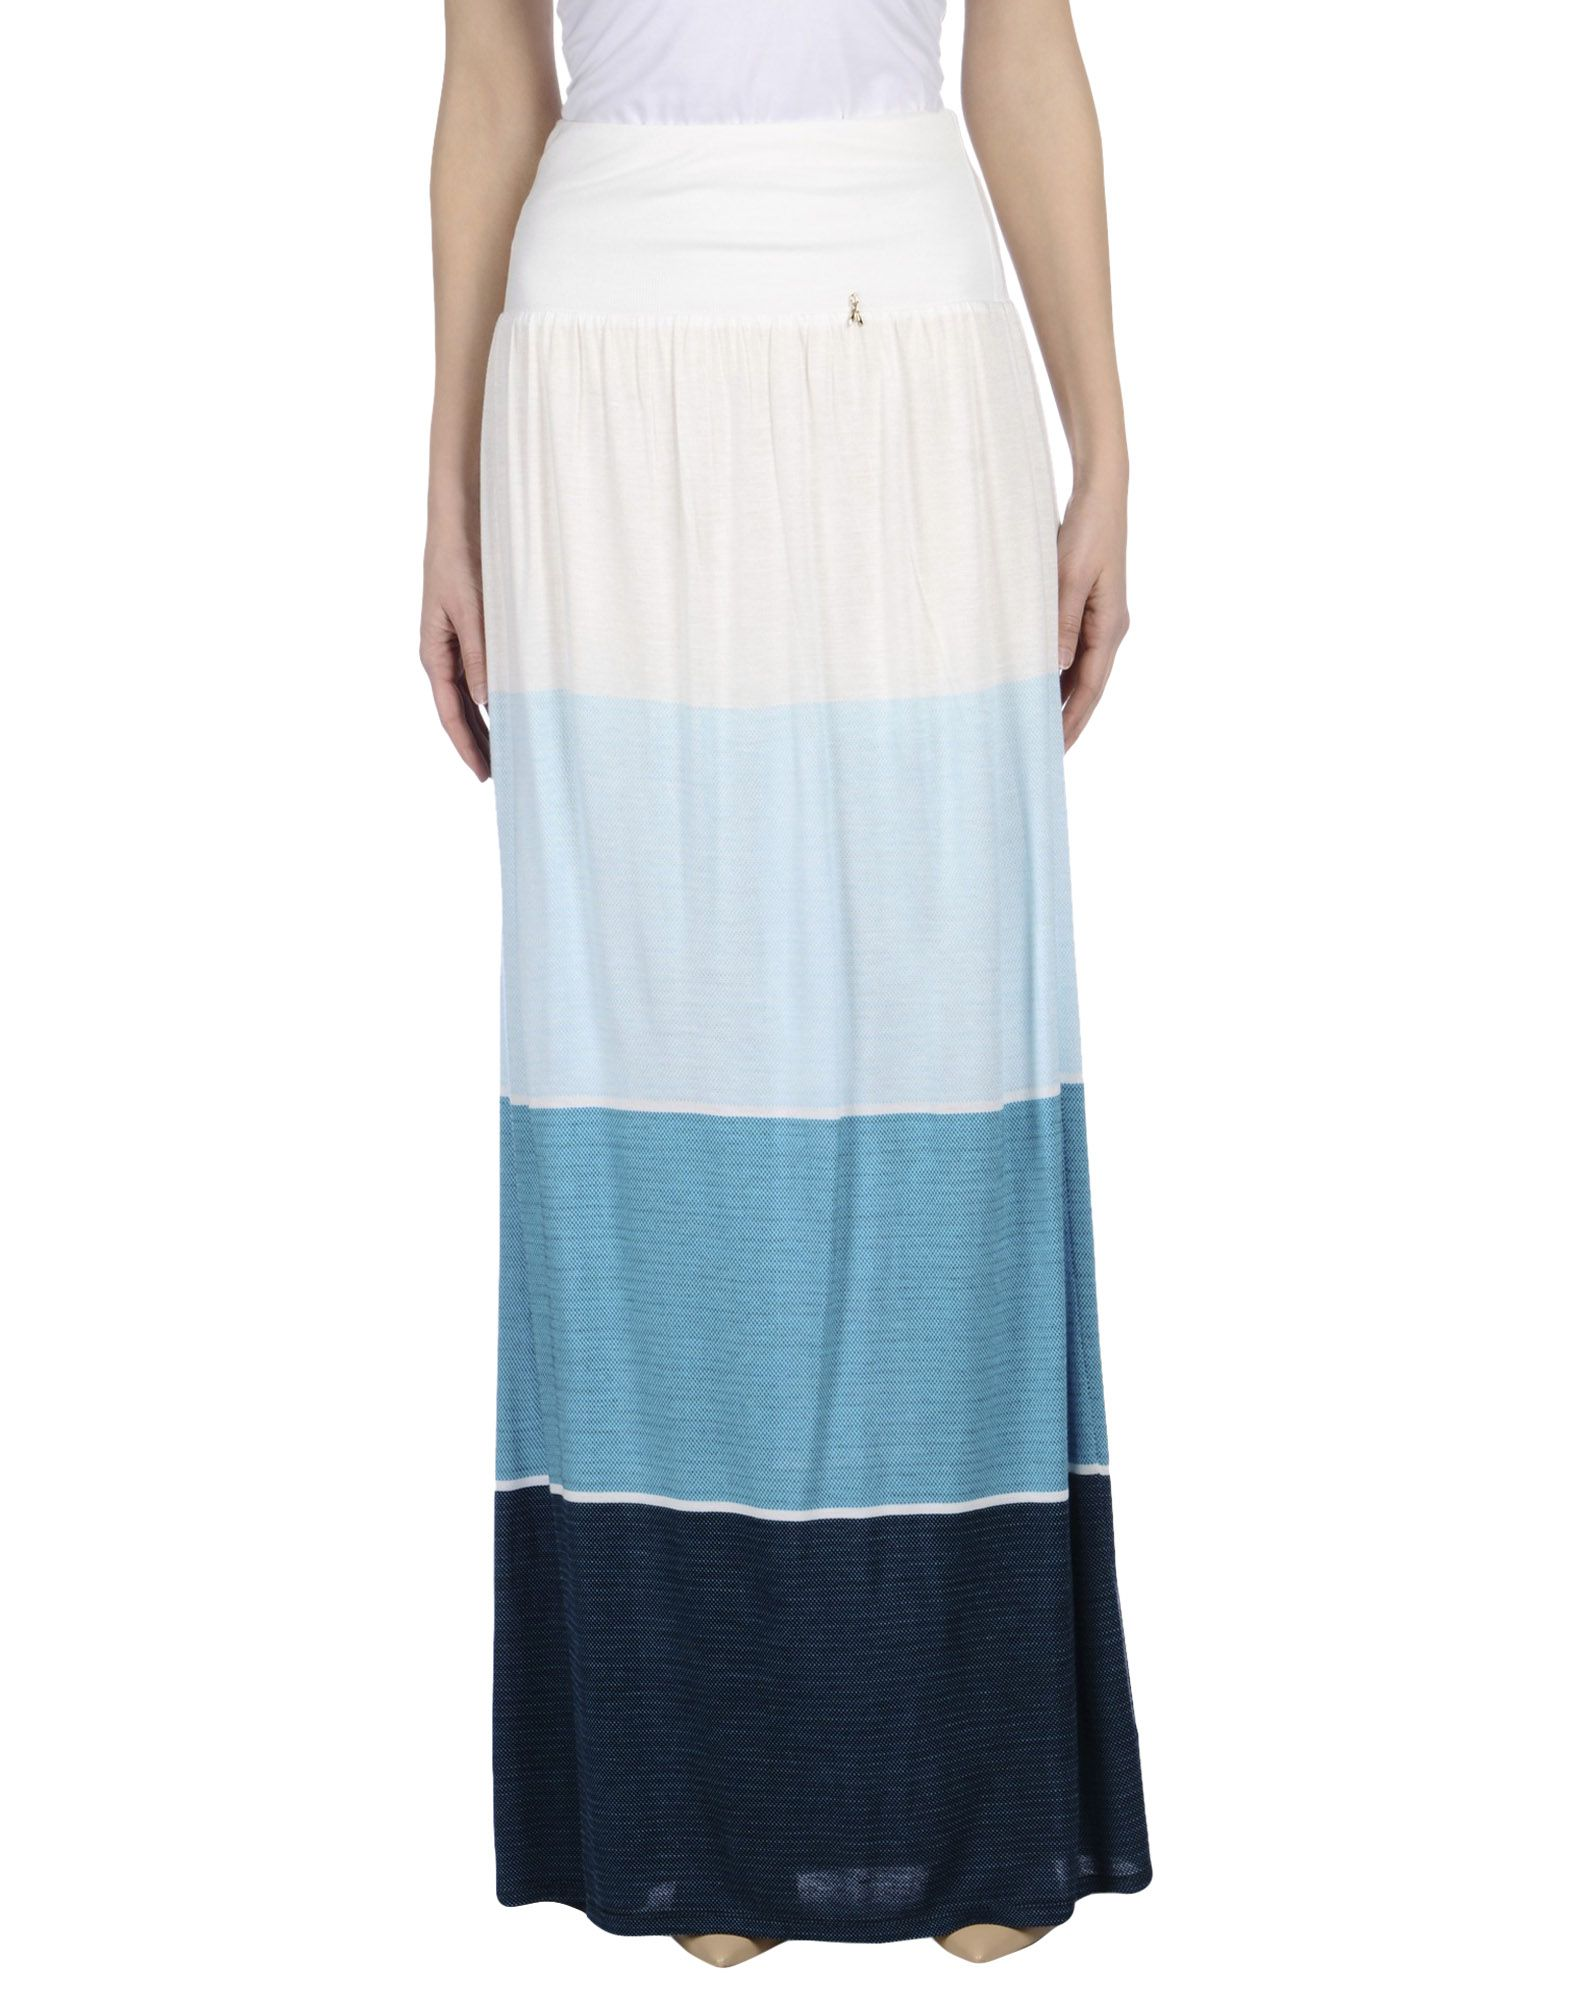 PATRIZIA PEPE Длинная юбка юбка patrizia pepe 2l0764 a2ya c602